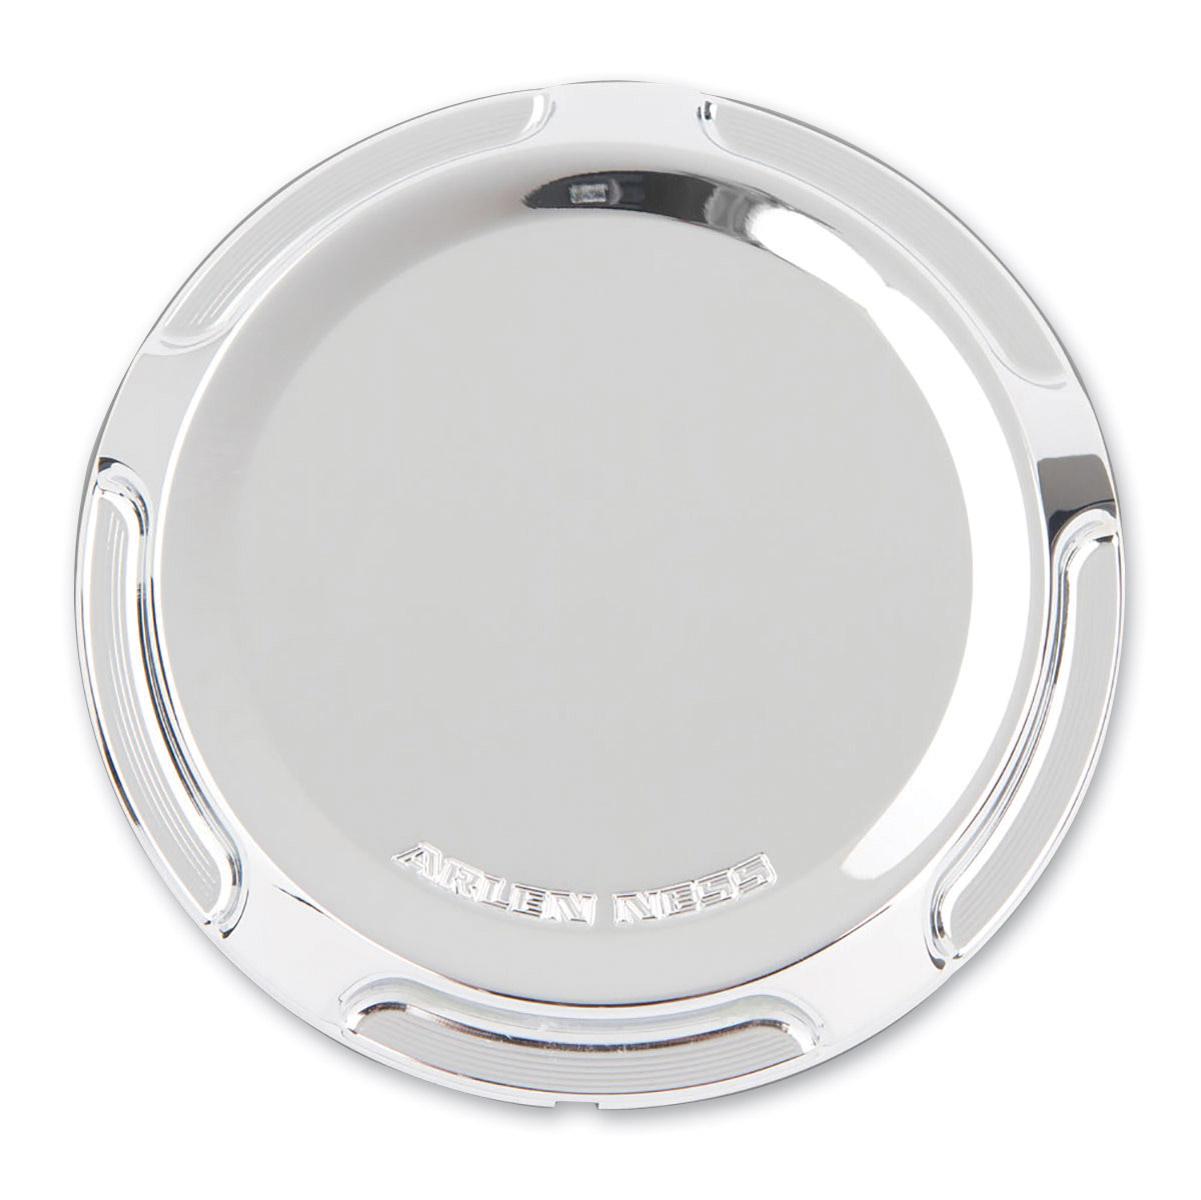 Arlen Ness Beveled Chrome Cam Cover